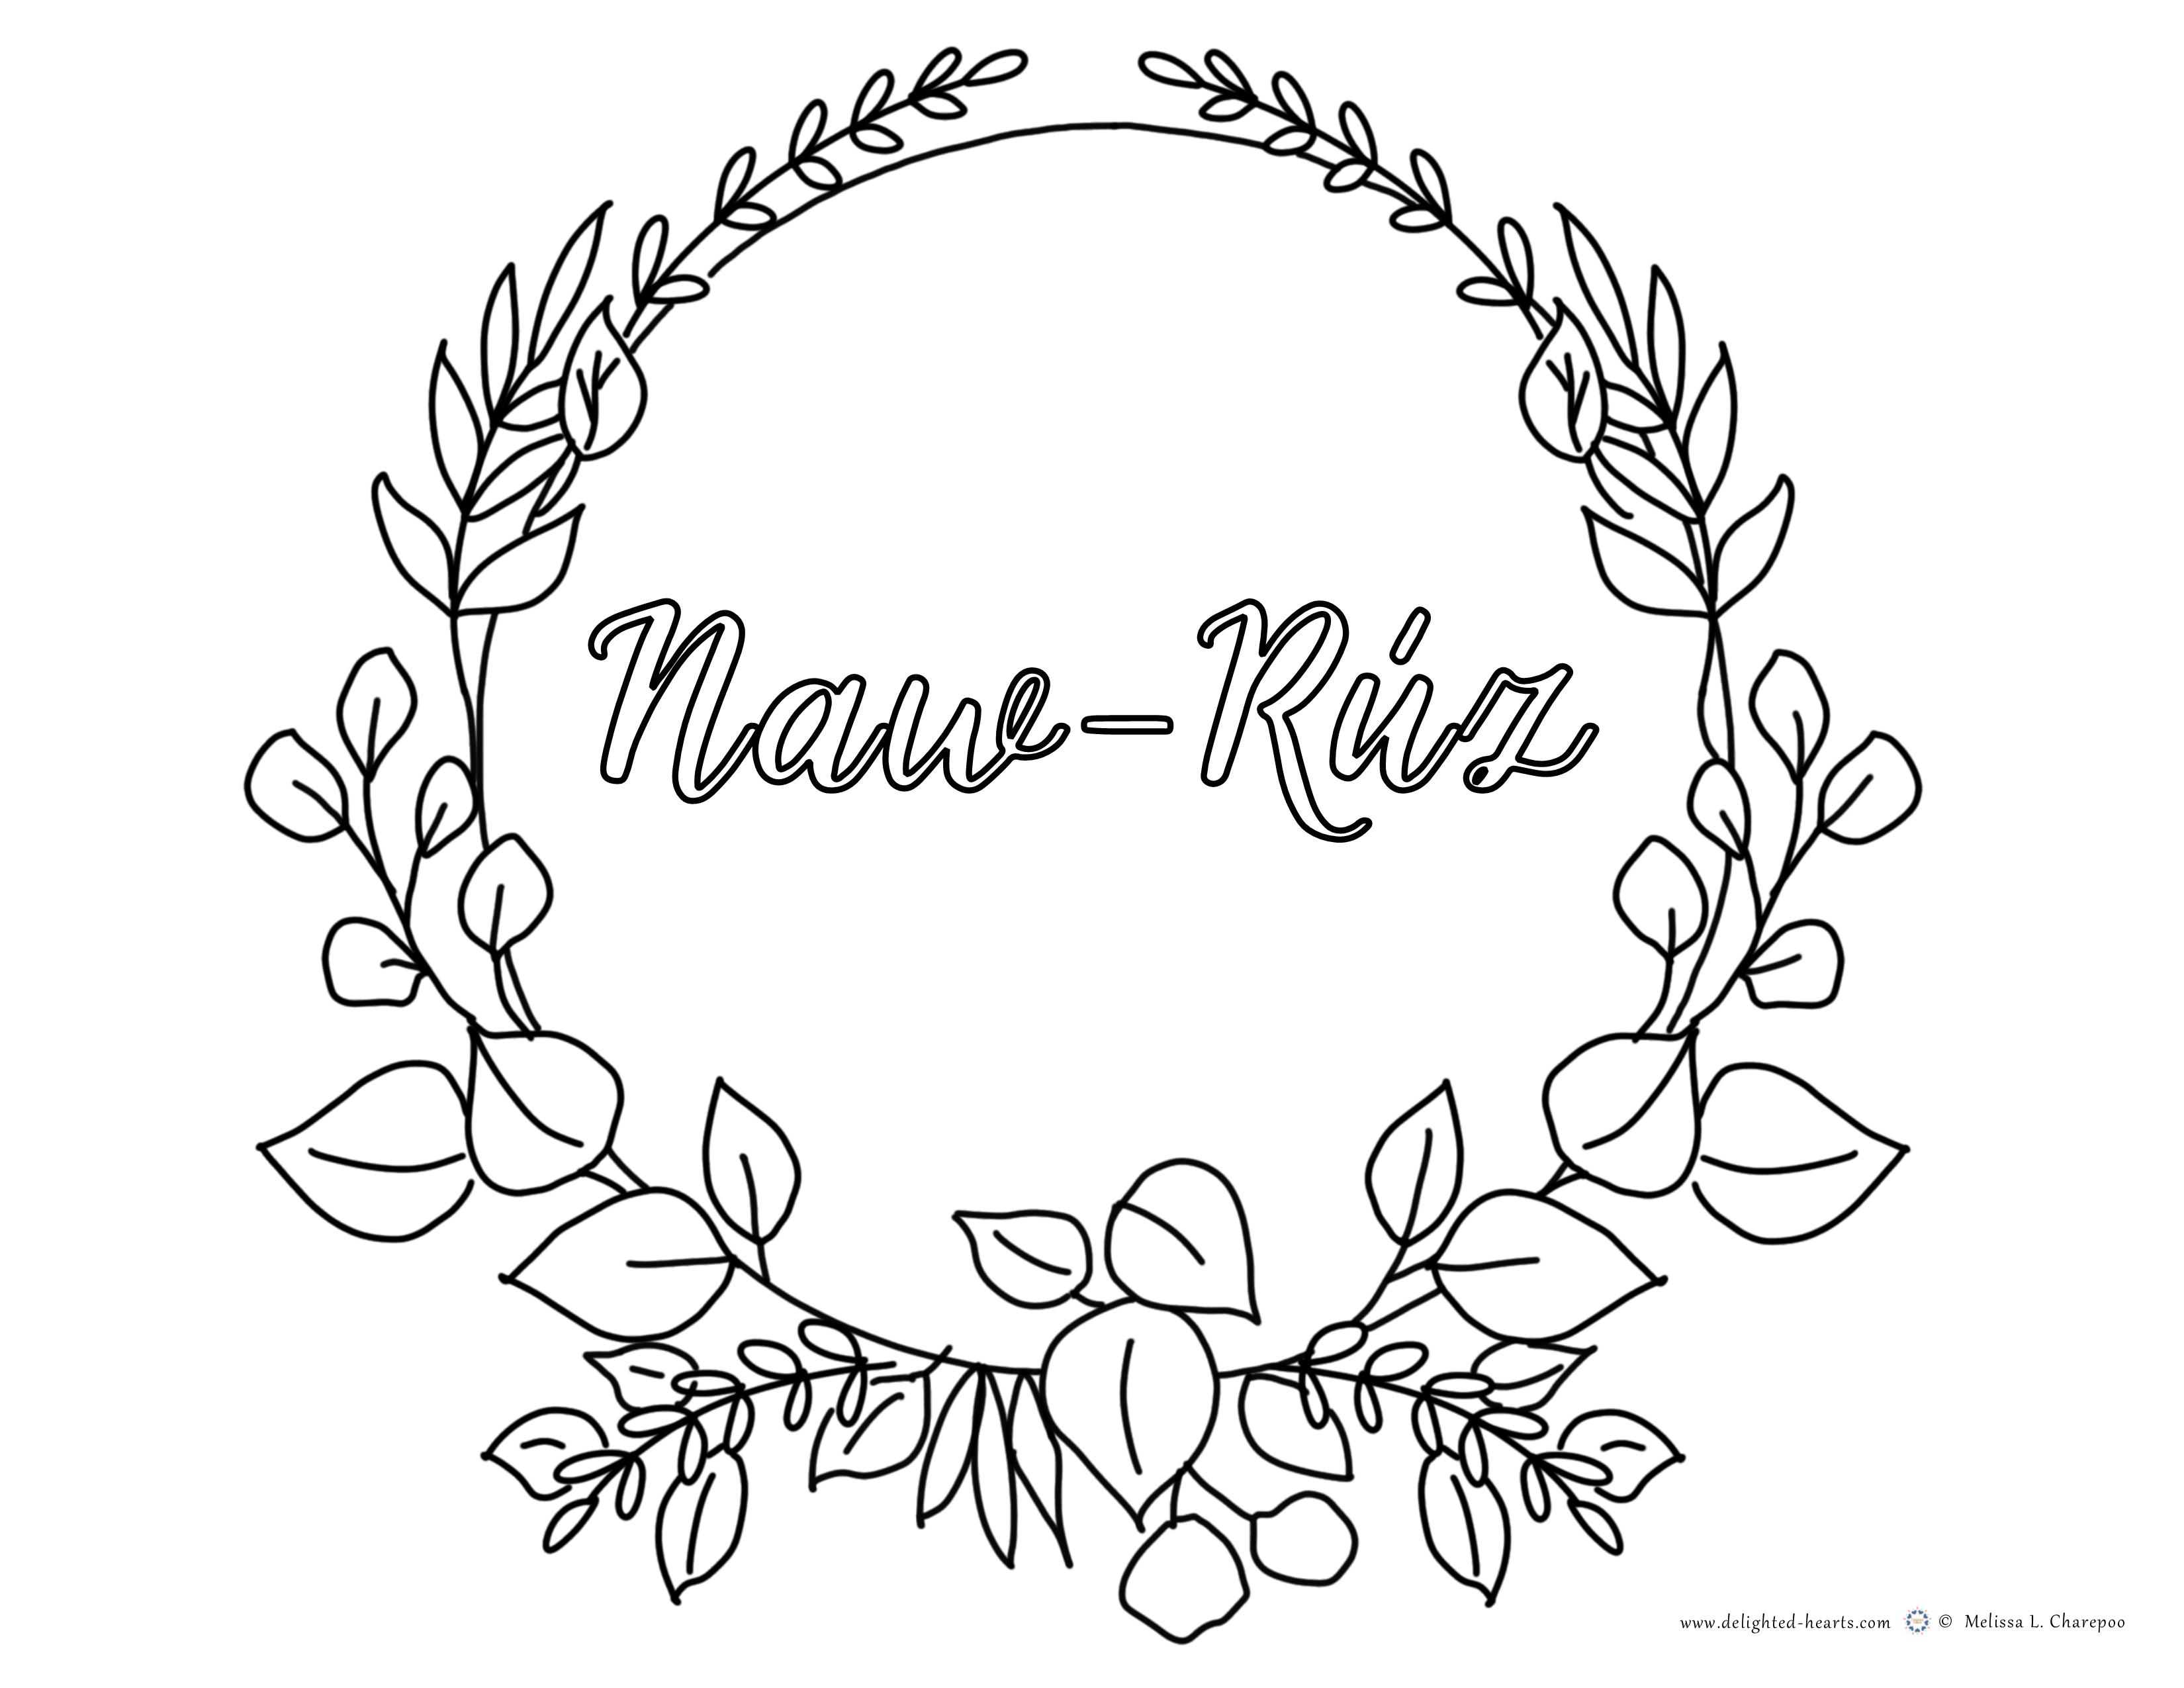 Naw-Ruz_178_DHLLC_Melissa Charepoo_Coloring Page_Naw-Ruz_LeavesWreath.png